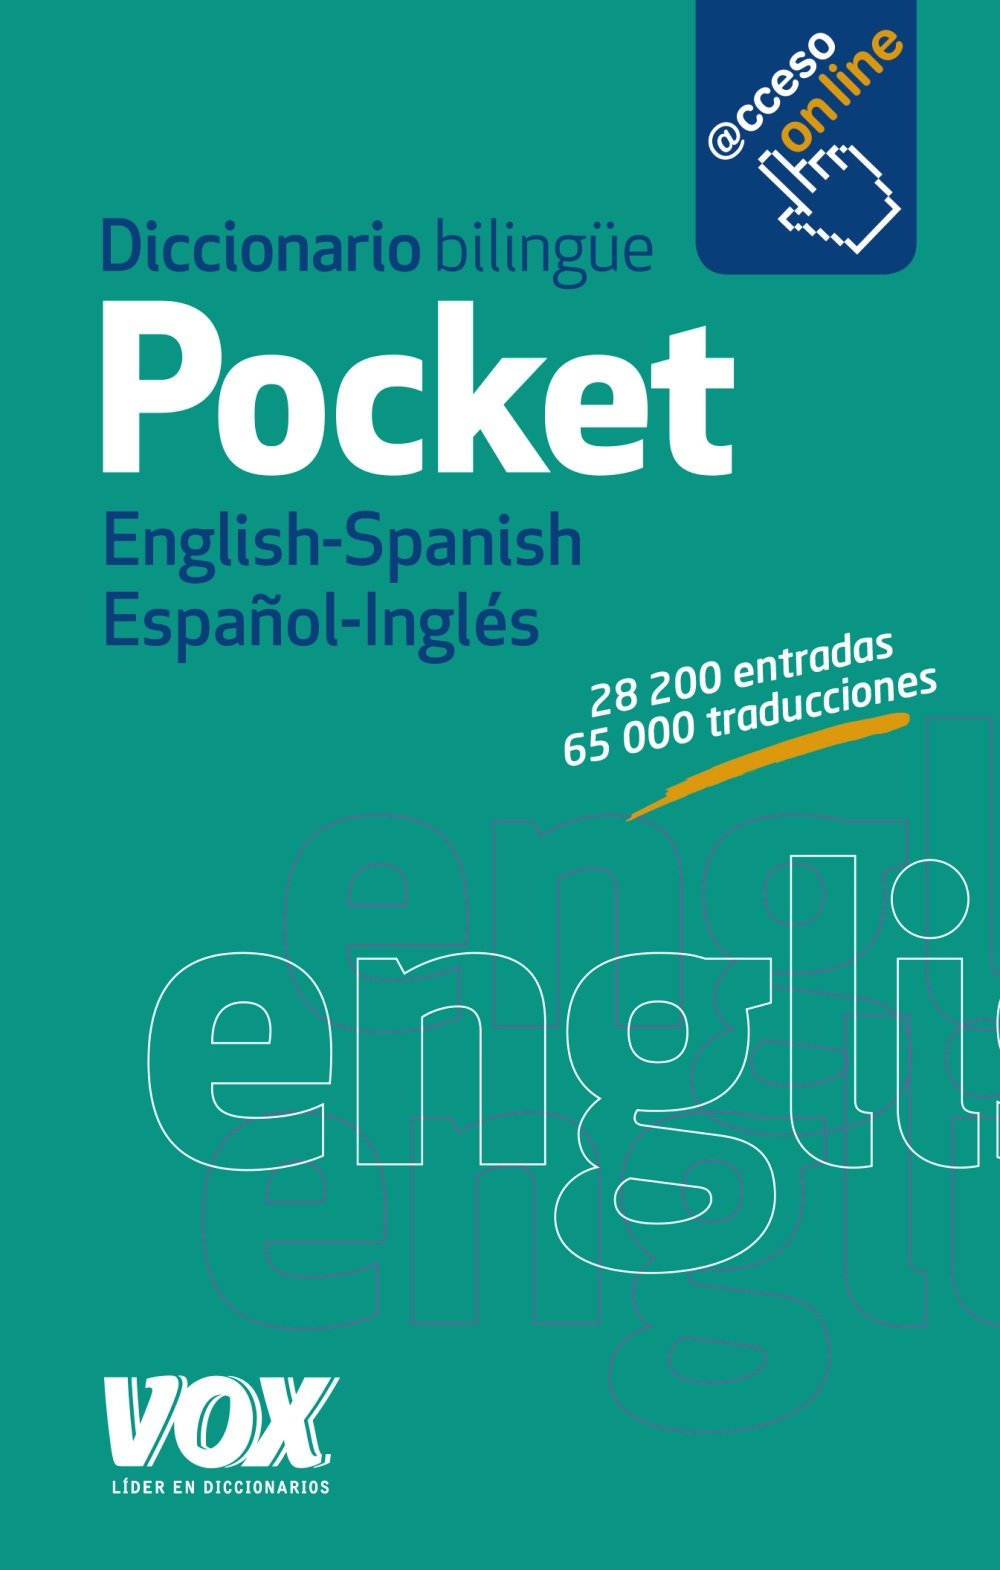 Diccionario Pocket English Spanish Español Inglés Spanish